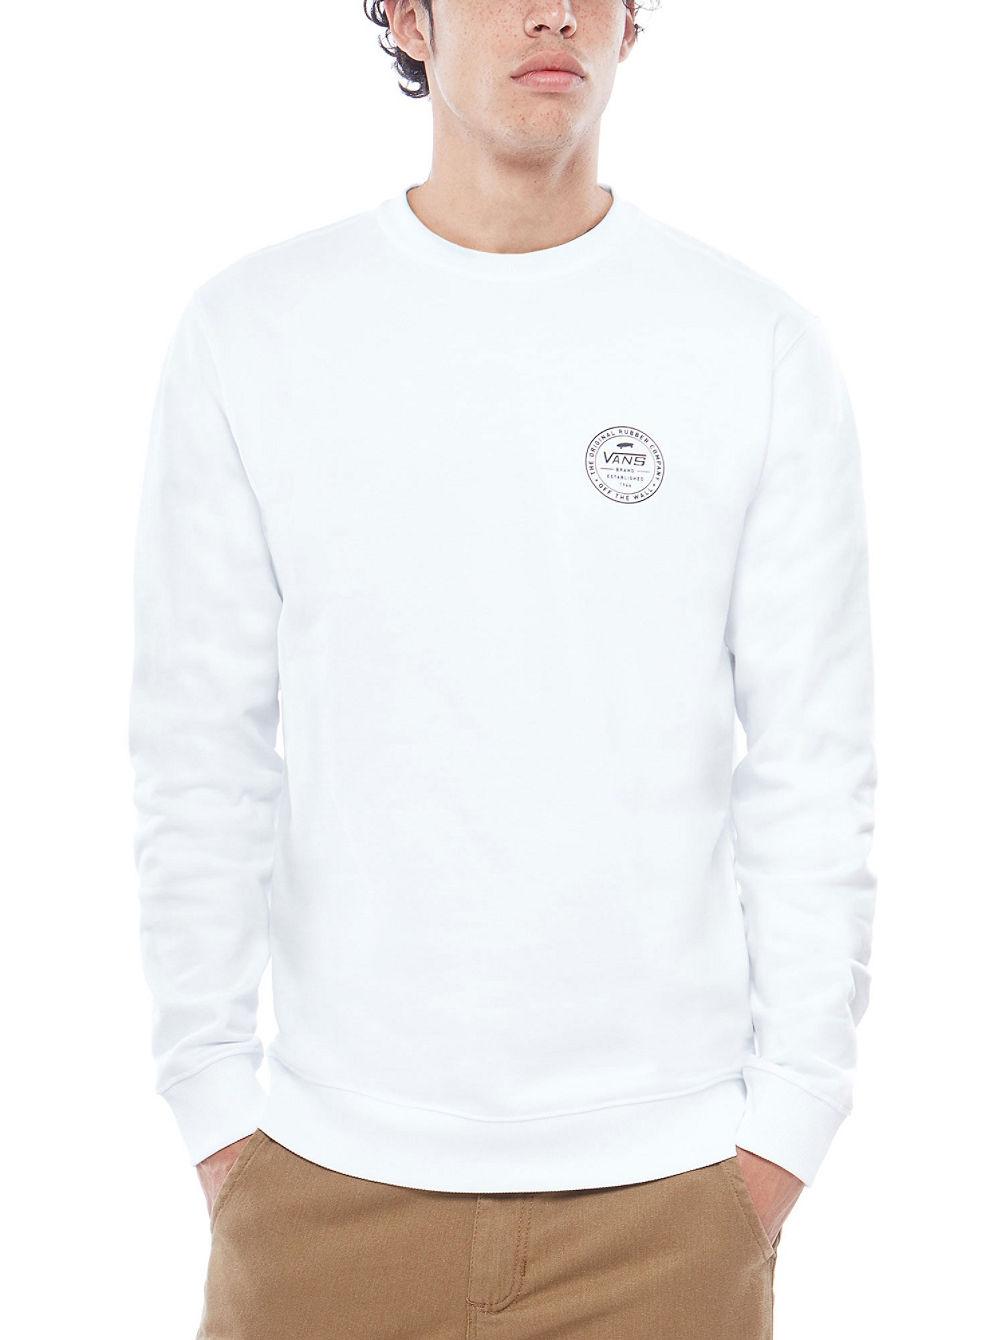 317f46fe86 Buy Vans Established 66 Crew Sweater online at blue-tomato.com